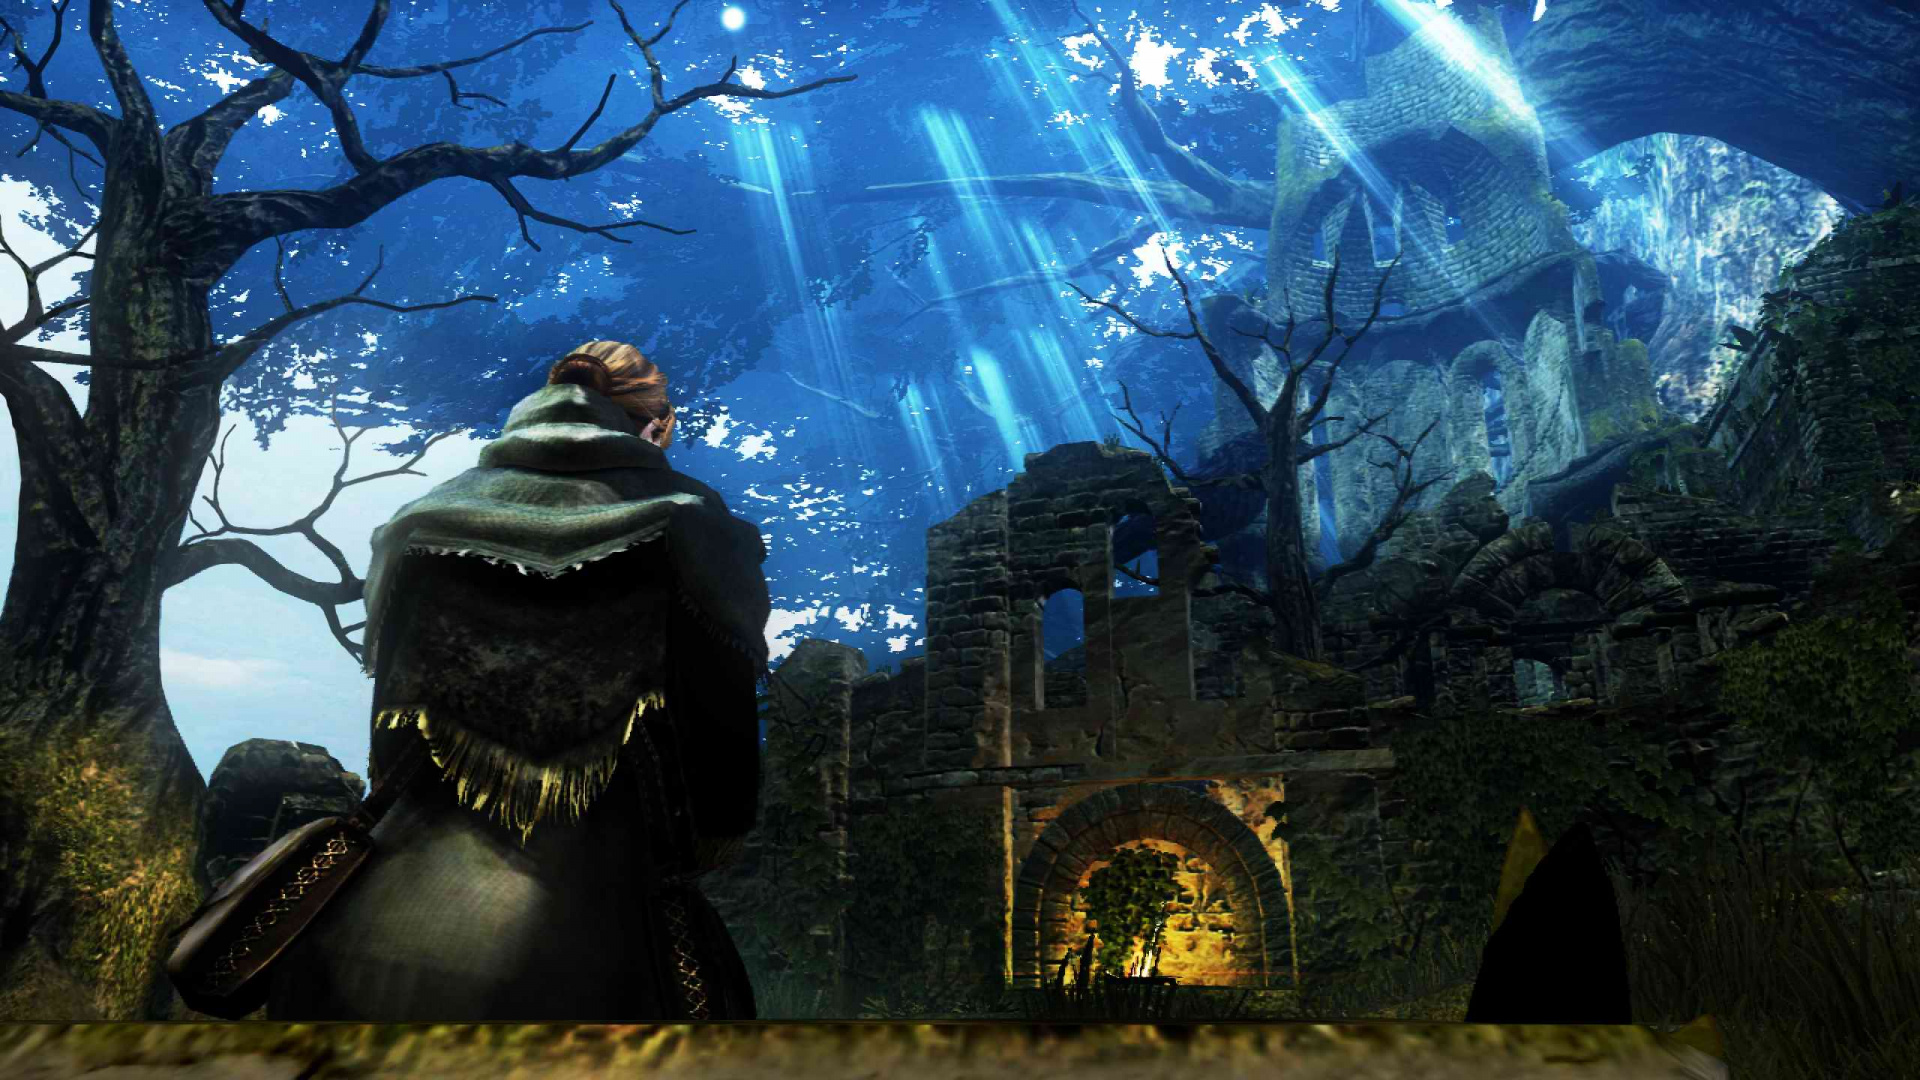 Dark Souls (PS3 / PlayStation 3) Game Profile | News ...